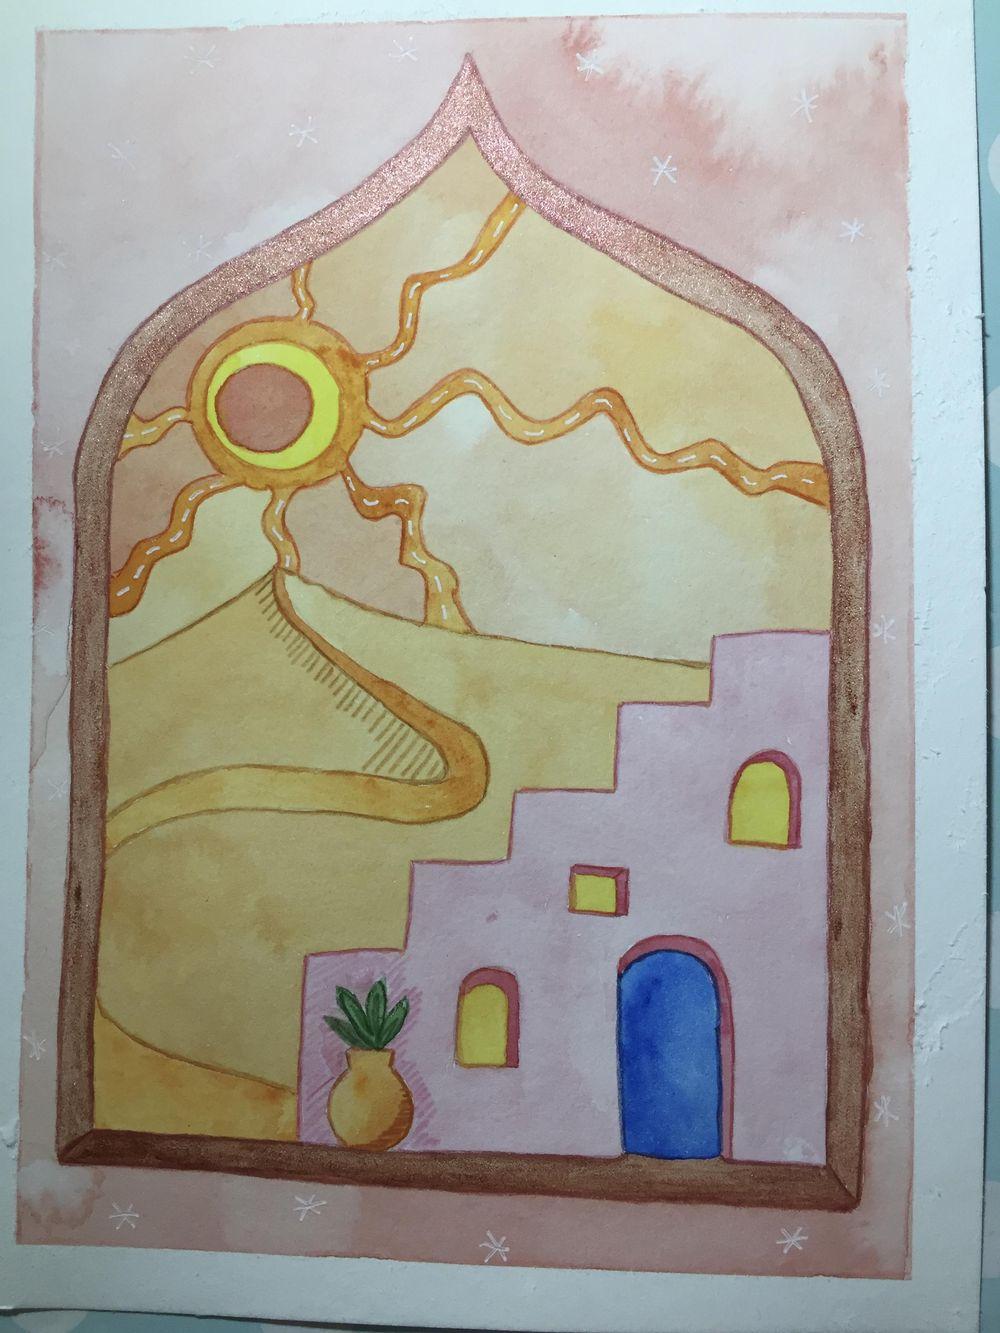 Mystical landscapes - image 2 - student project